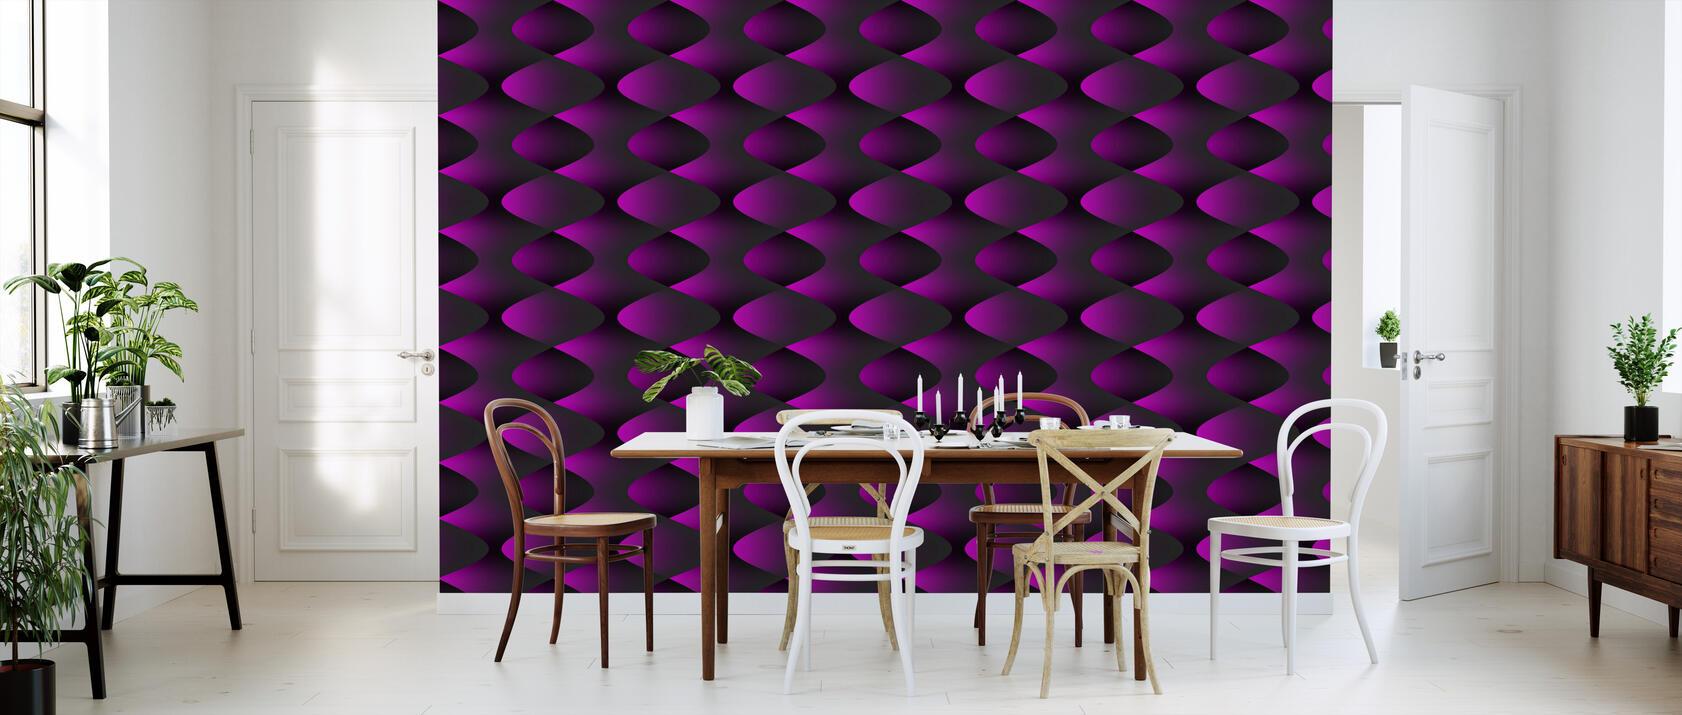 magenta einzigartige tapete h chster qualit t photowall. Black Bedroom Furniture Sets. Home Design Ideas